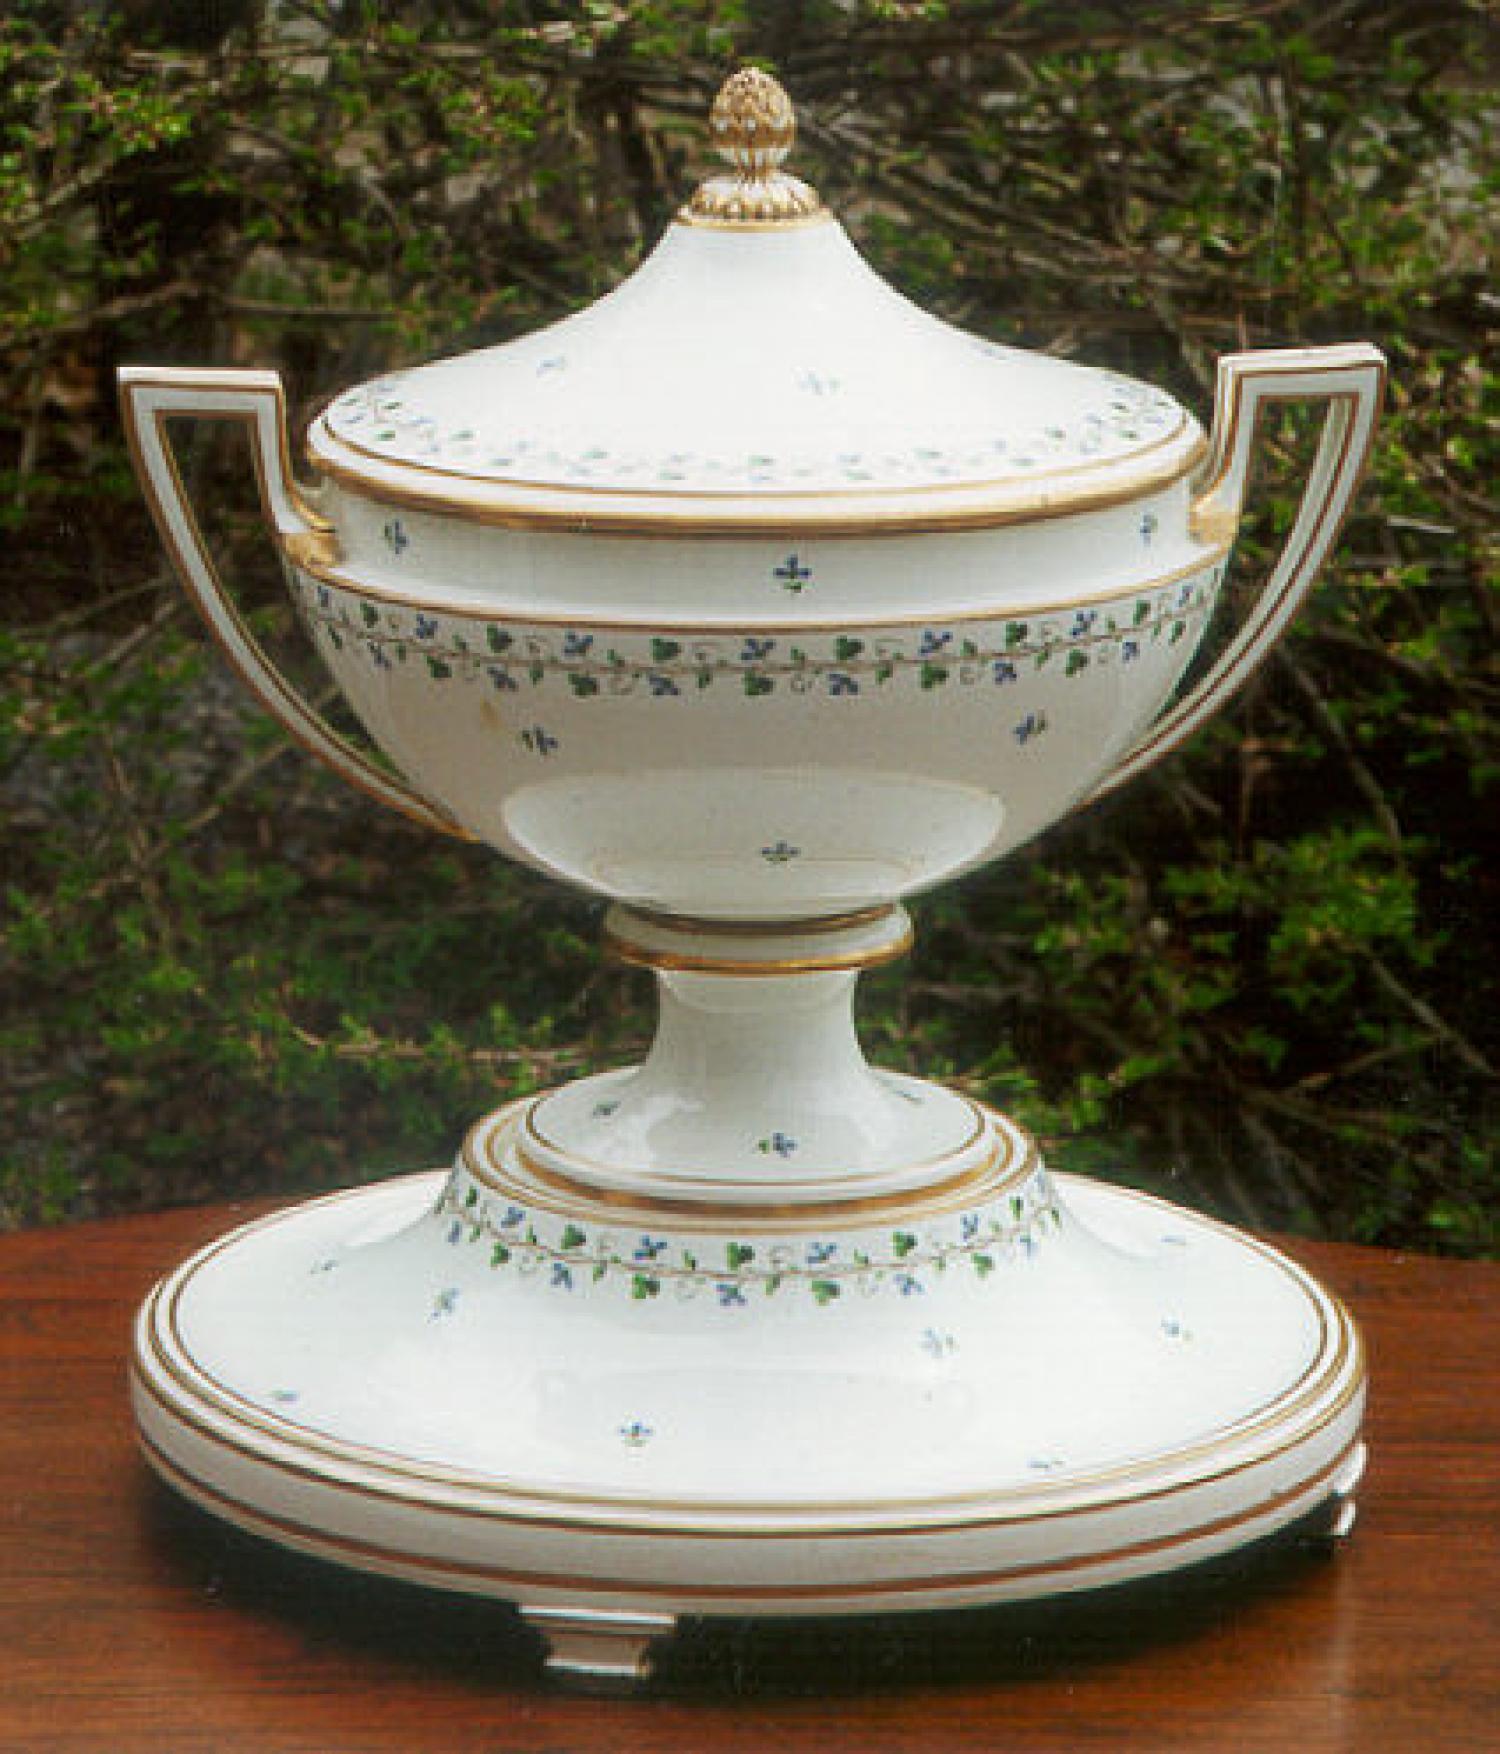 Royal Vienna Porcelain Pedestal Tureen c1812